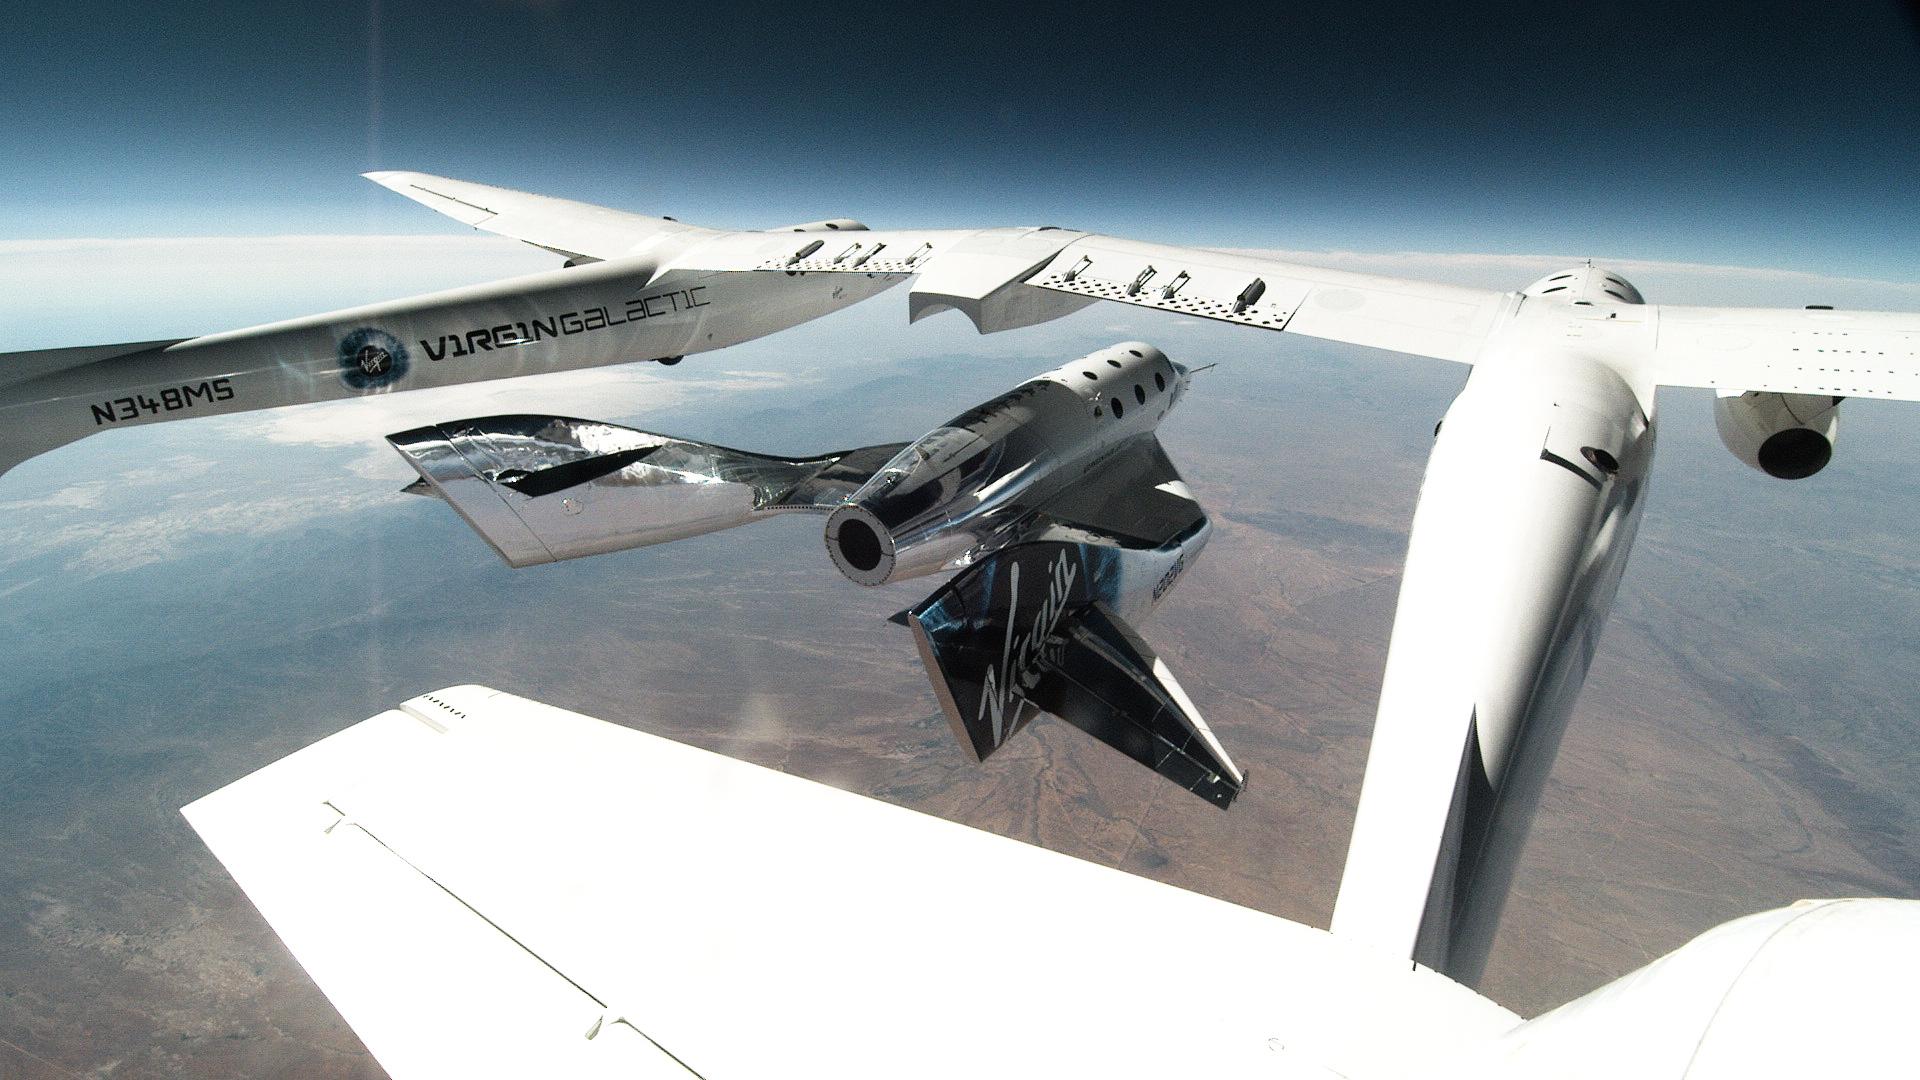 Virgin Galactic ramps up glide testing at Spaceport America